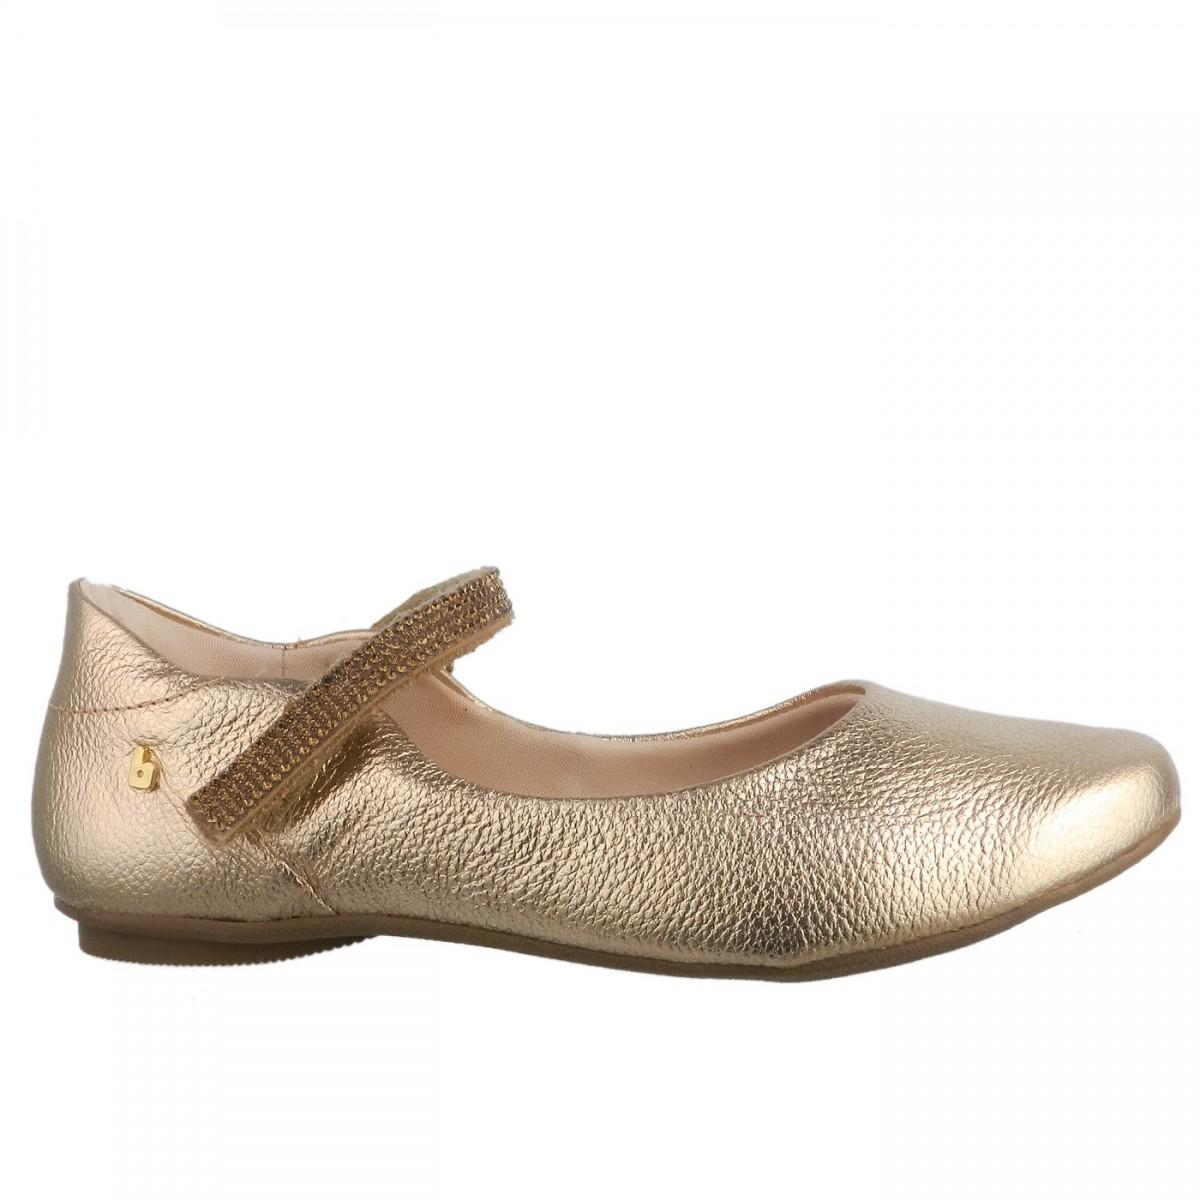 ade1b82cfa4 Bizz Store - Sapatilha Infantil Feminina Bibi Melody II Dourada